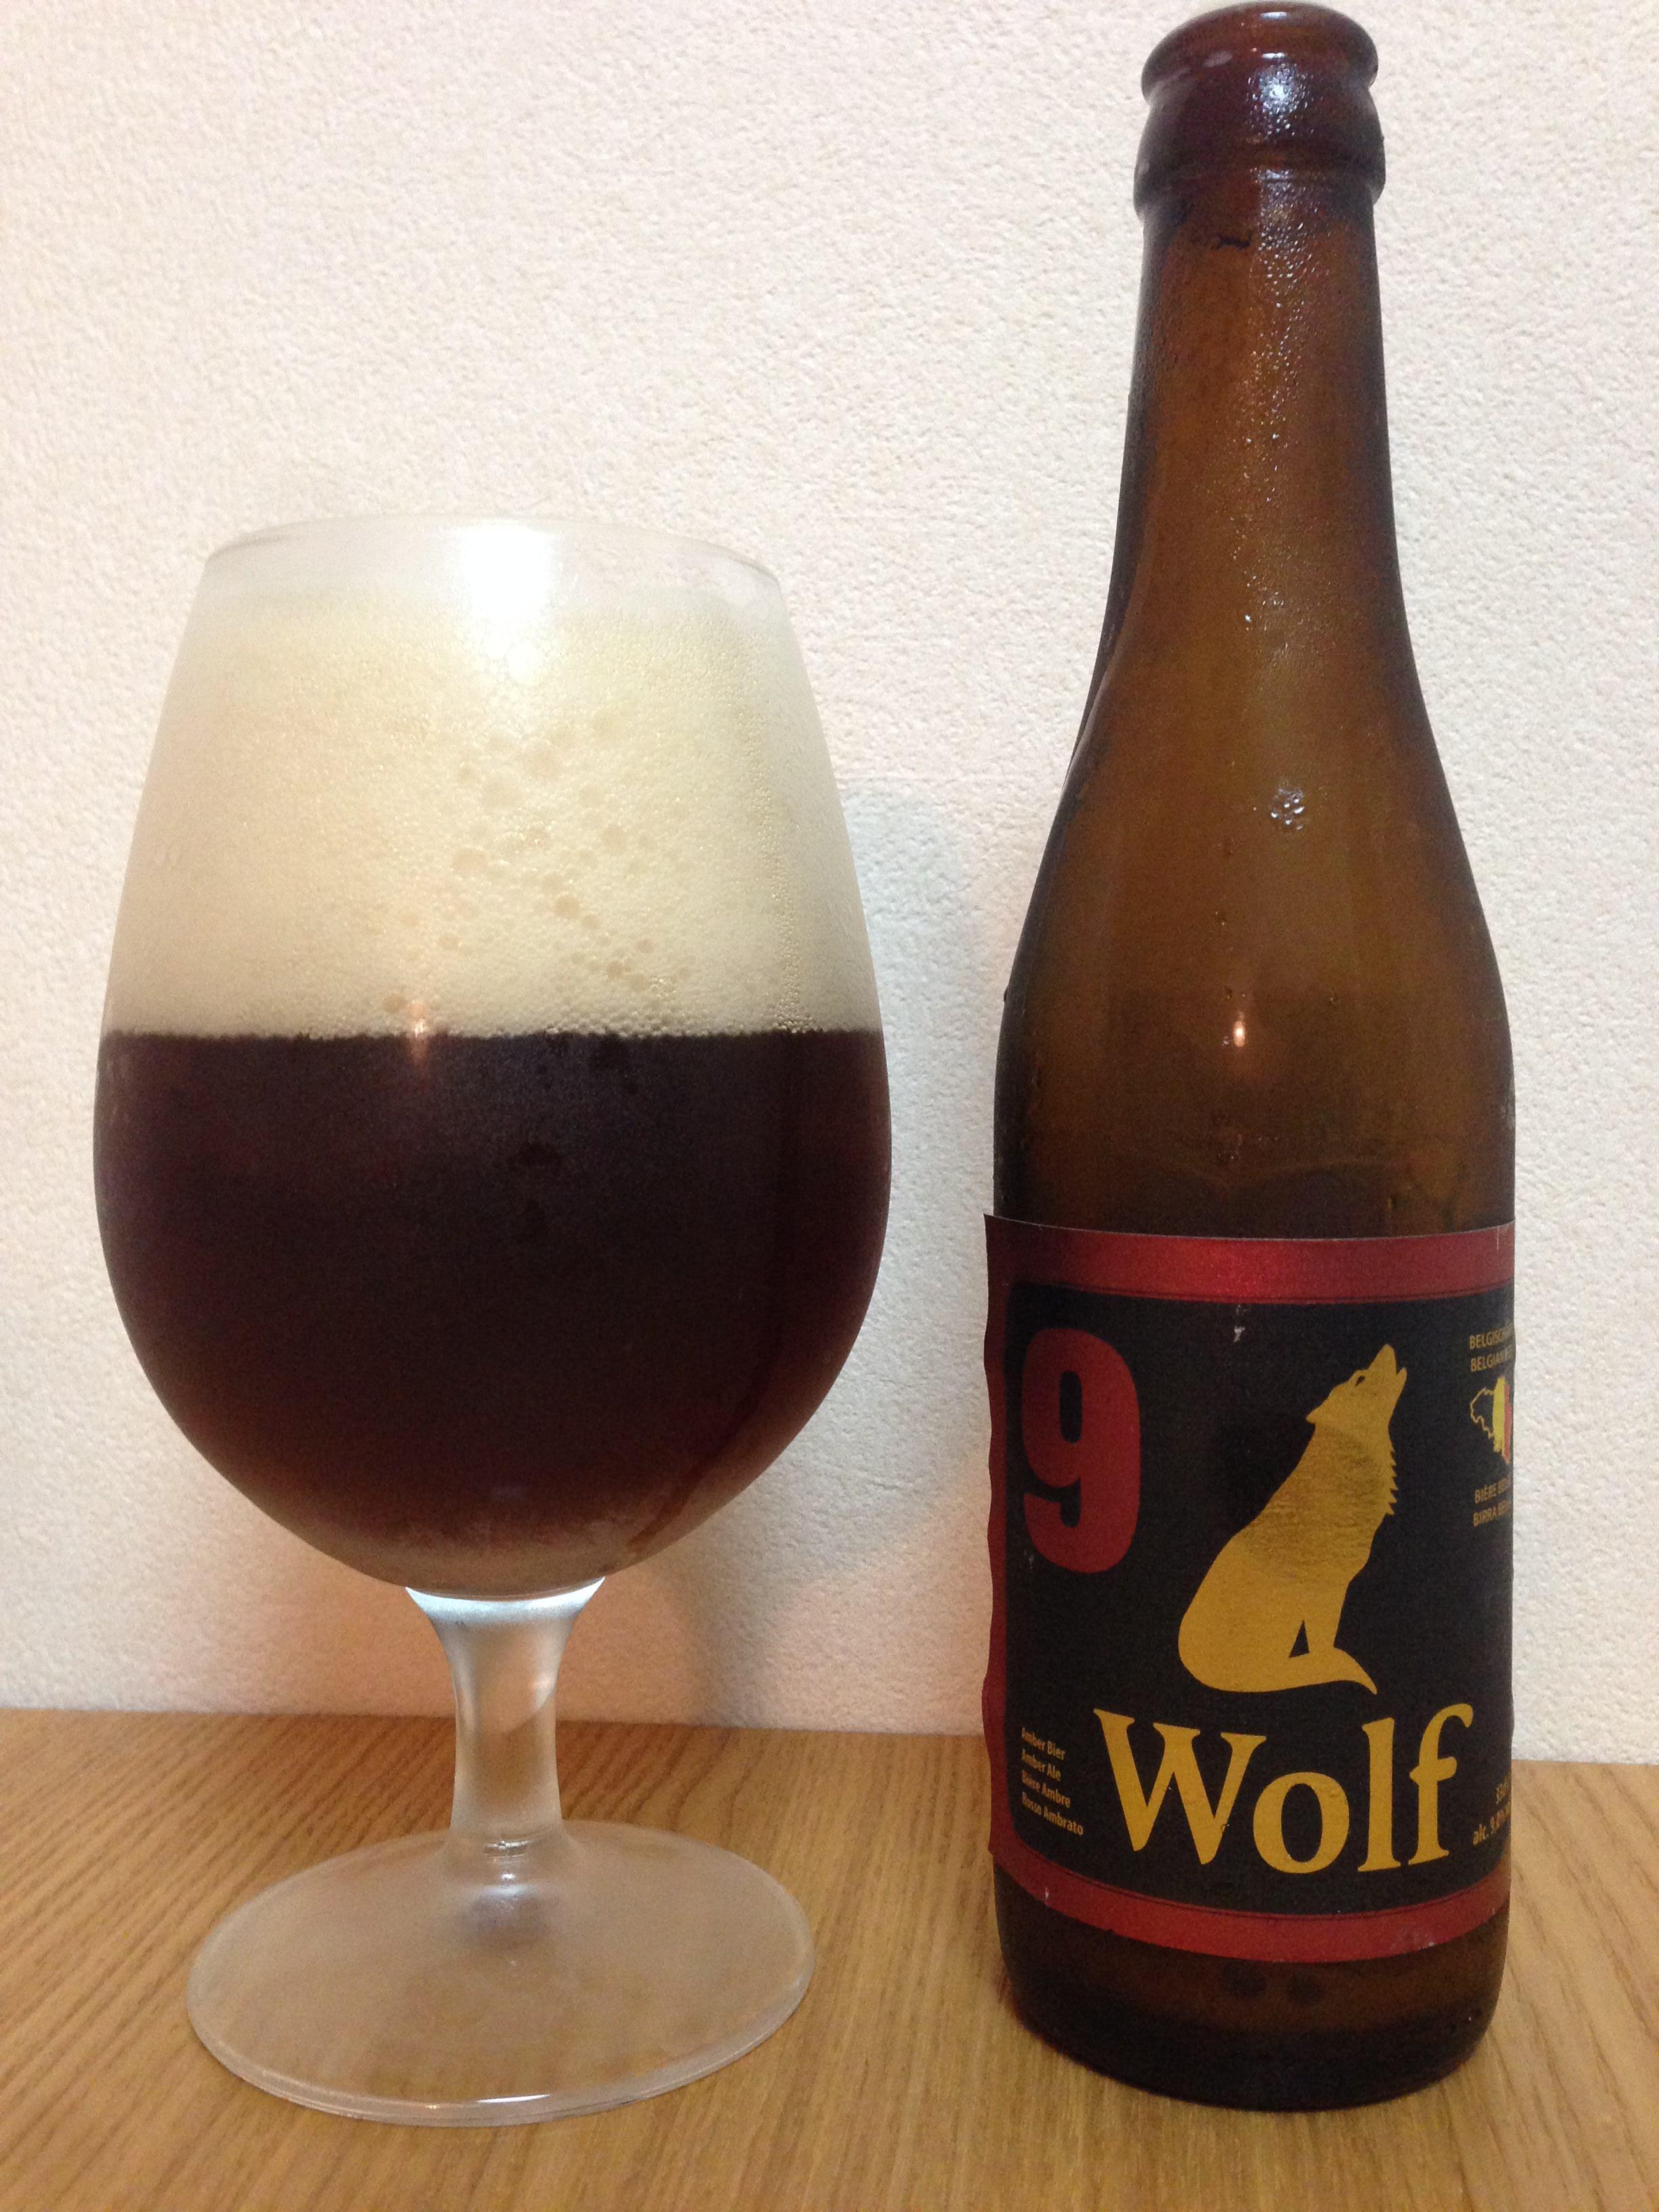 Wolf 9(ウルフ 9)